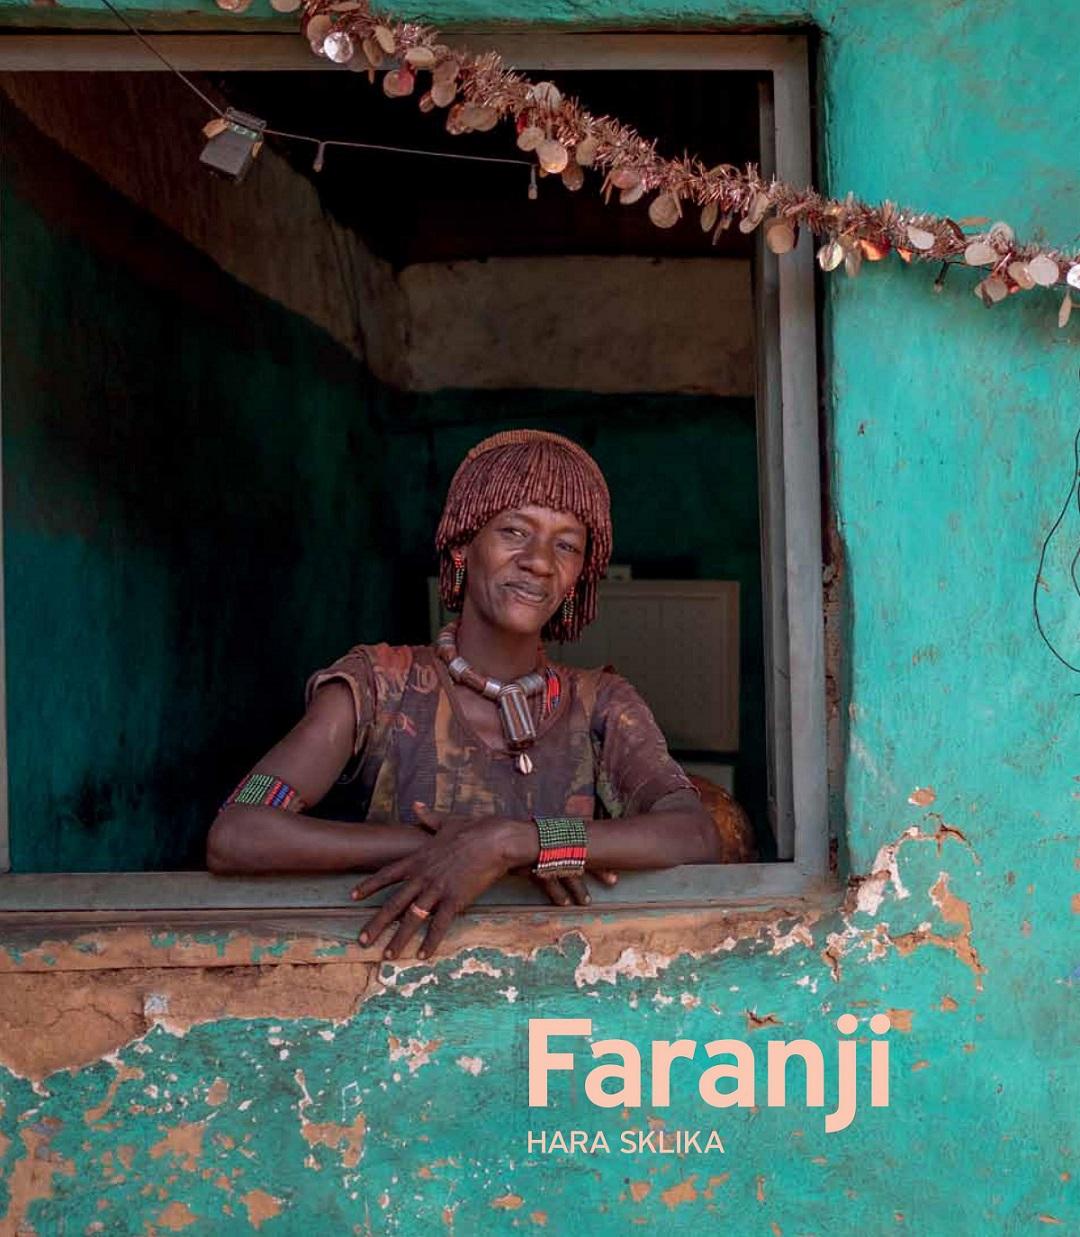 Faranji (ελληνική έκδοση)